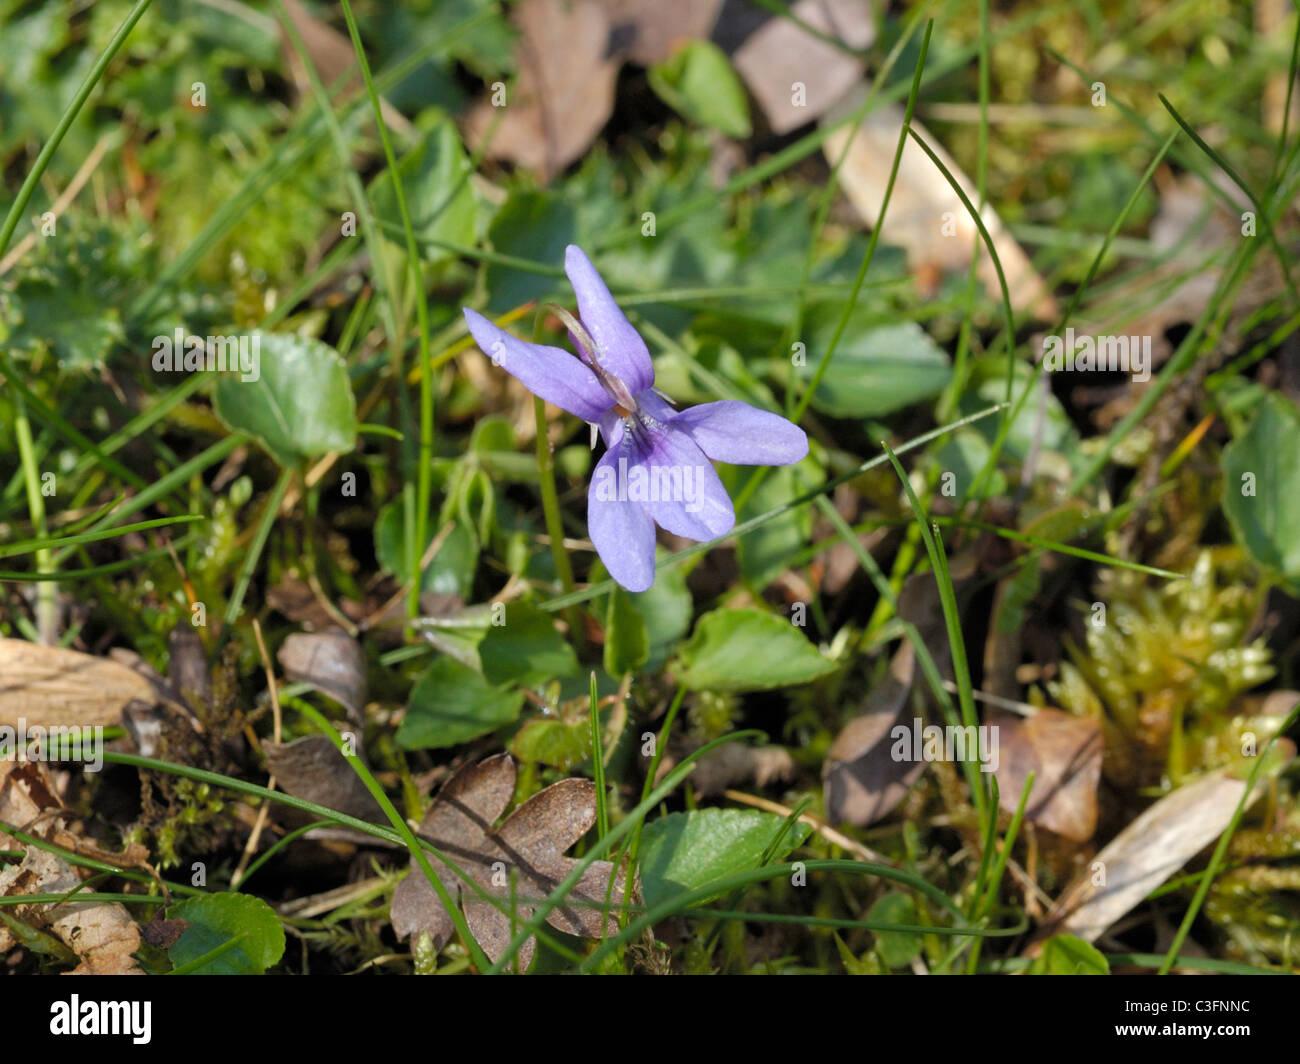 Early Dog-violet, viola reichenbachiana - Stock Image